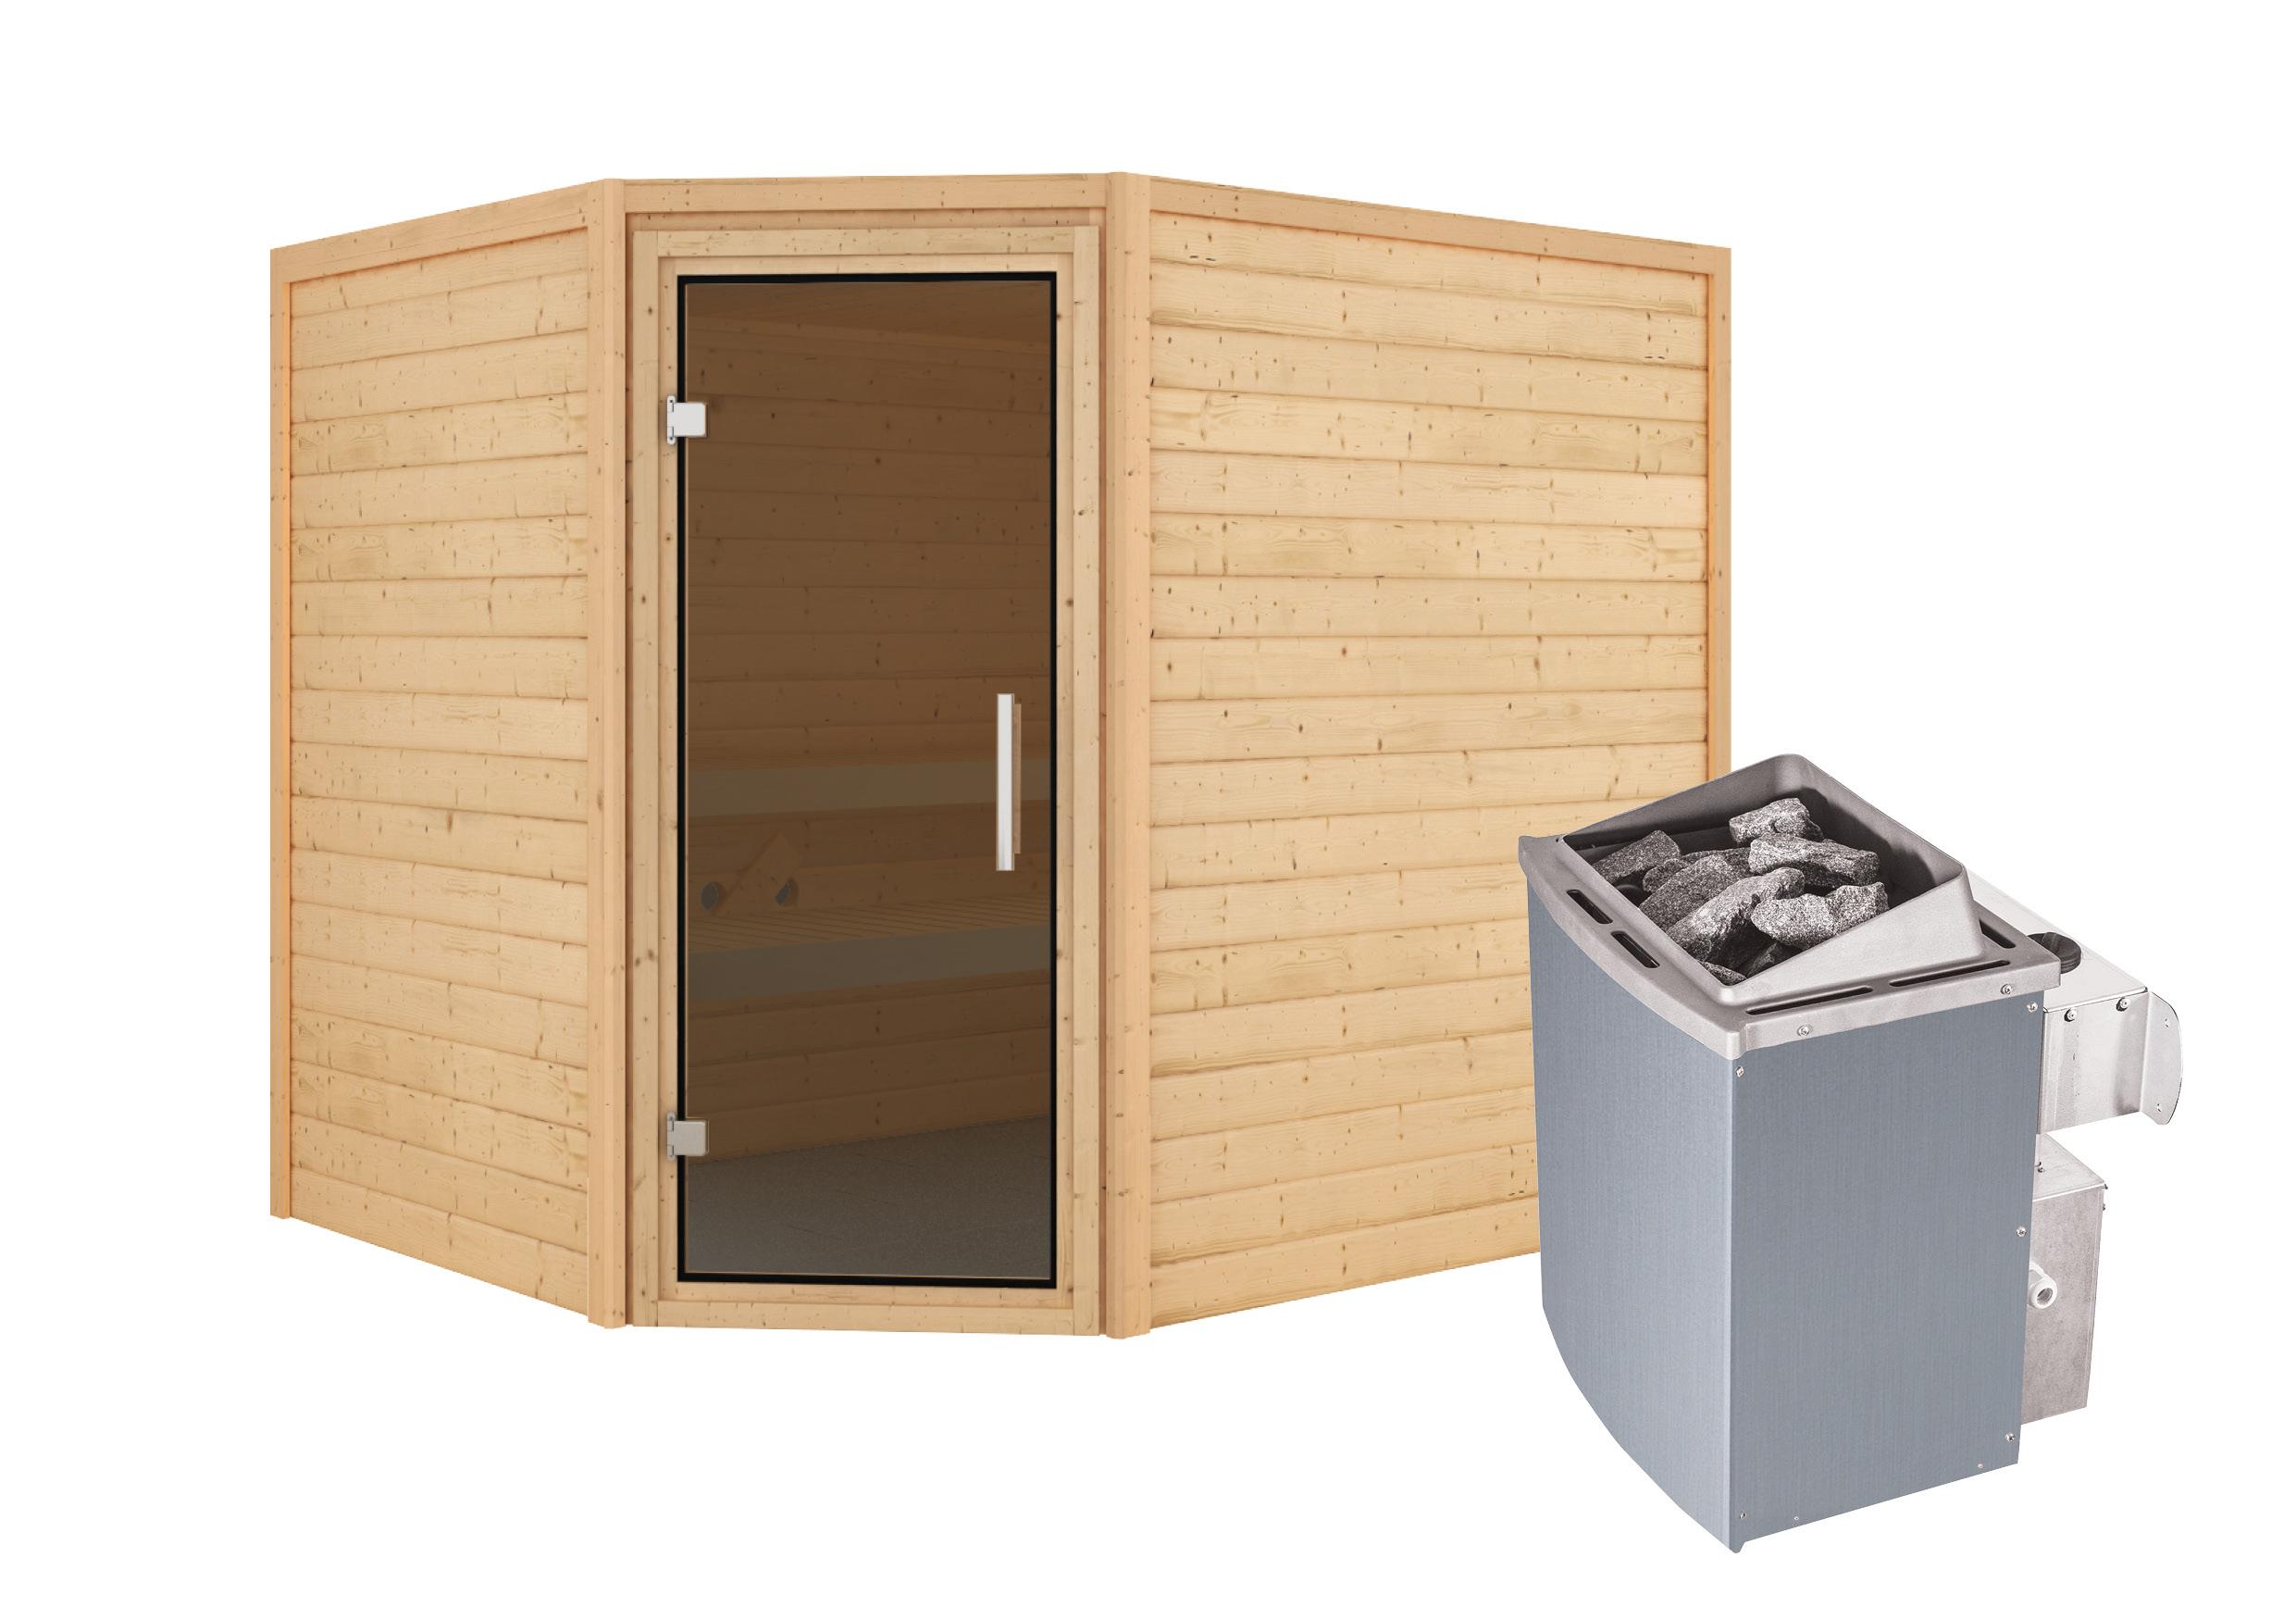 Woodfeeling Sauna Lisa 38mm Ofen 9kW intern Tür Modern Bild 5